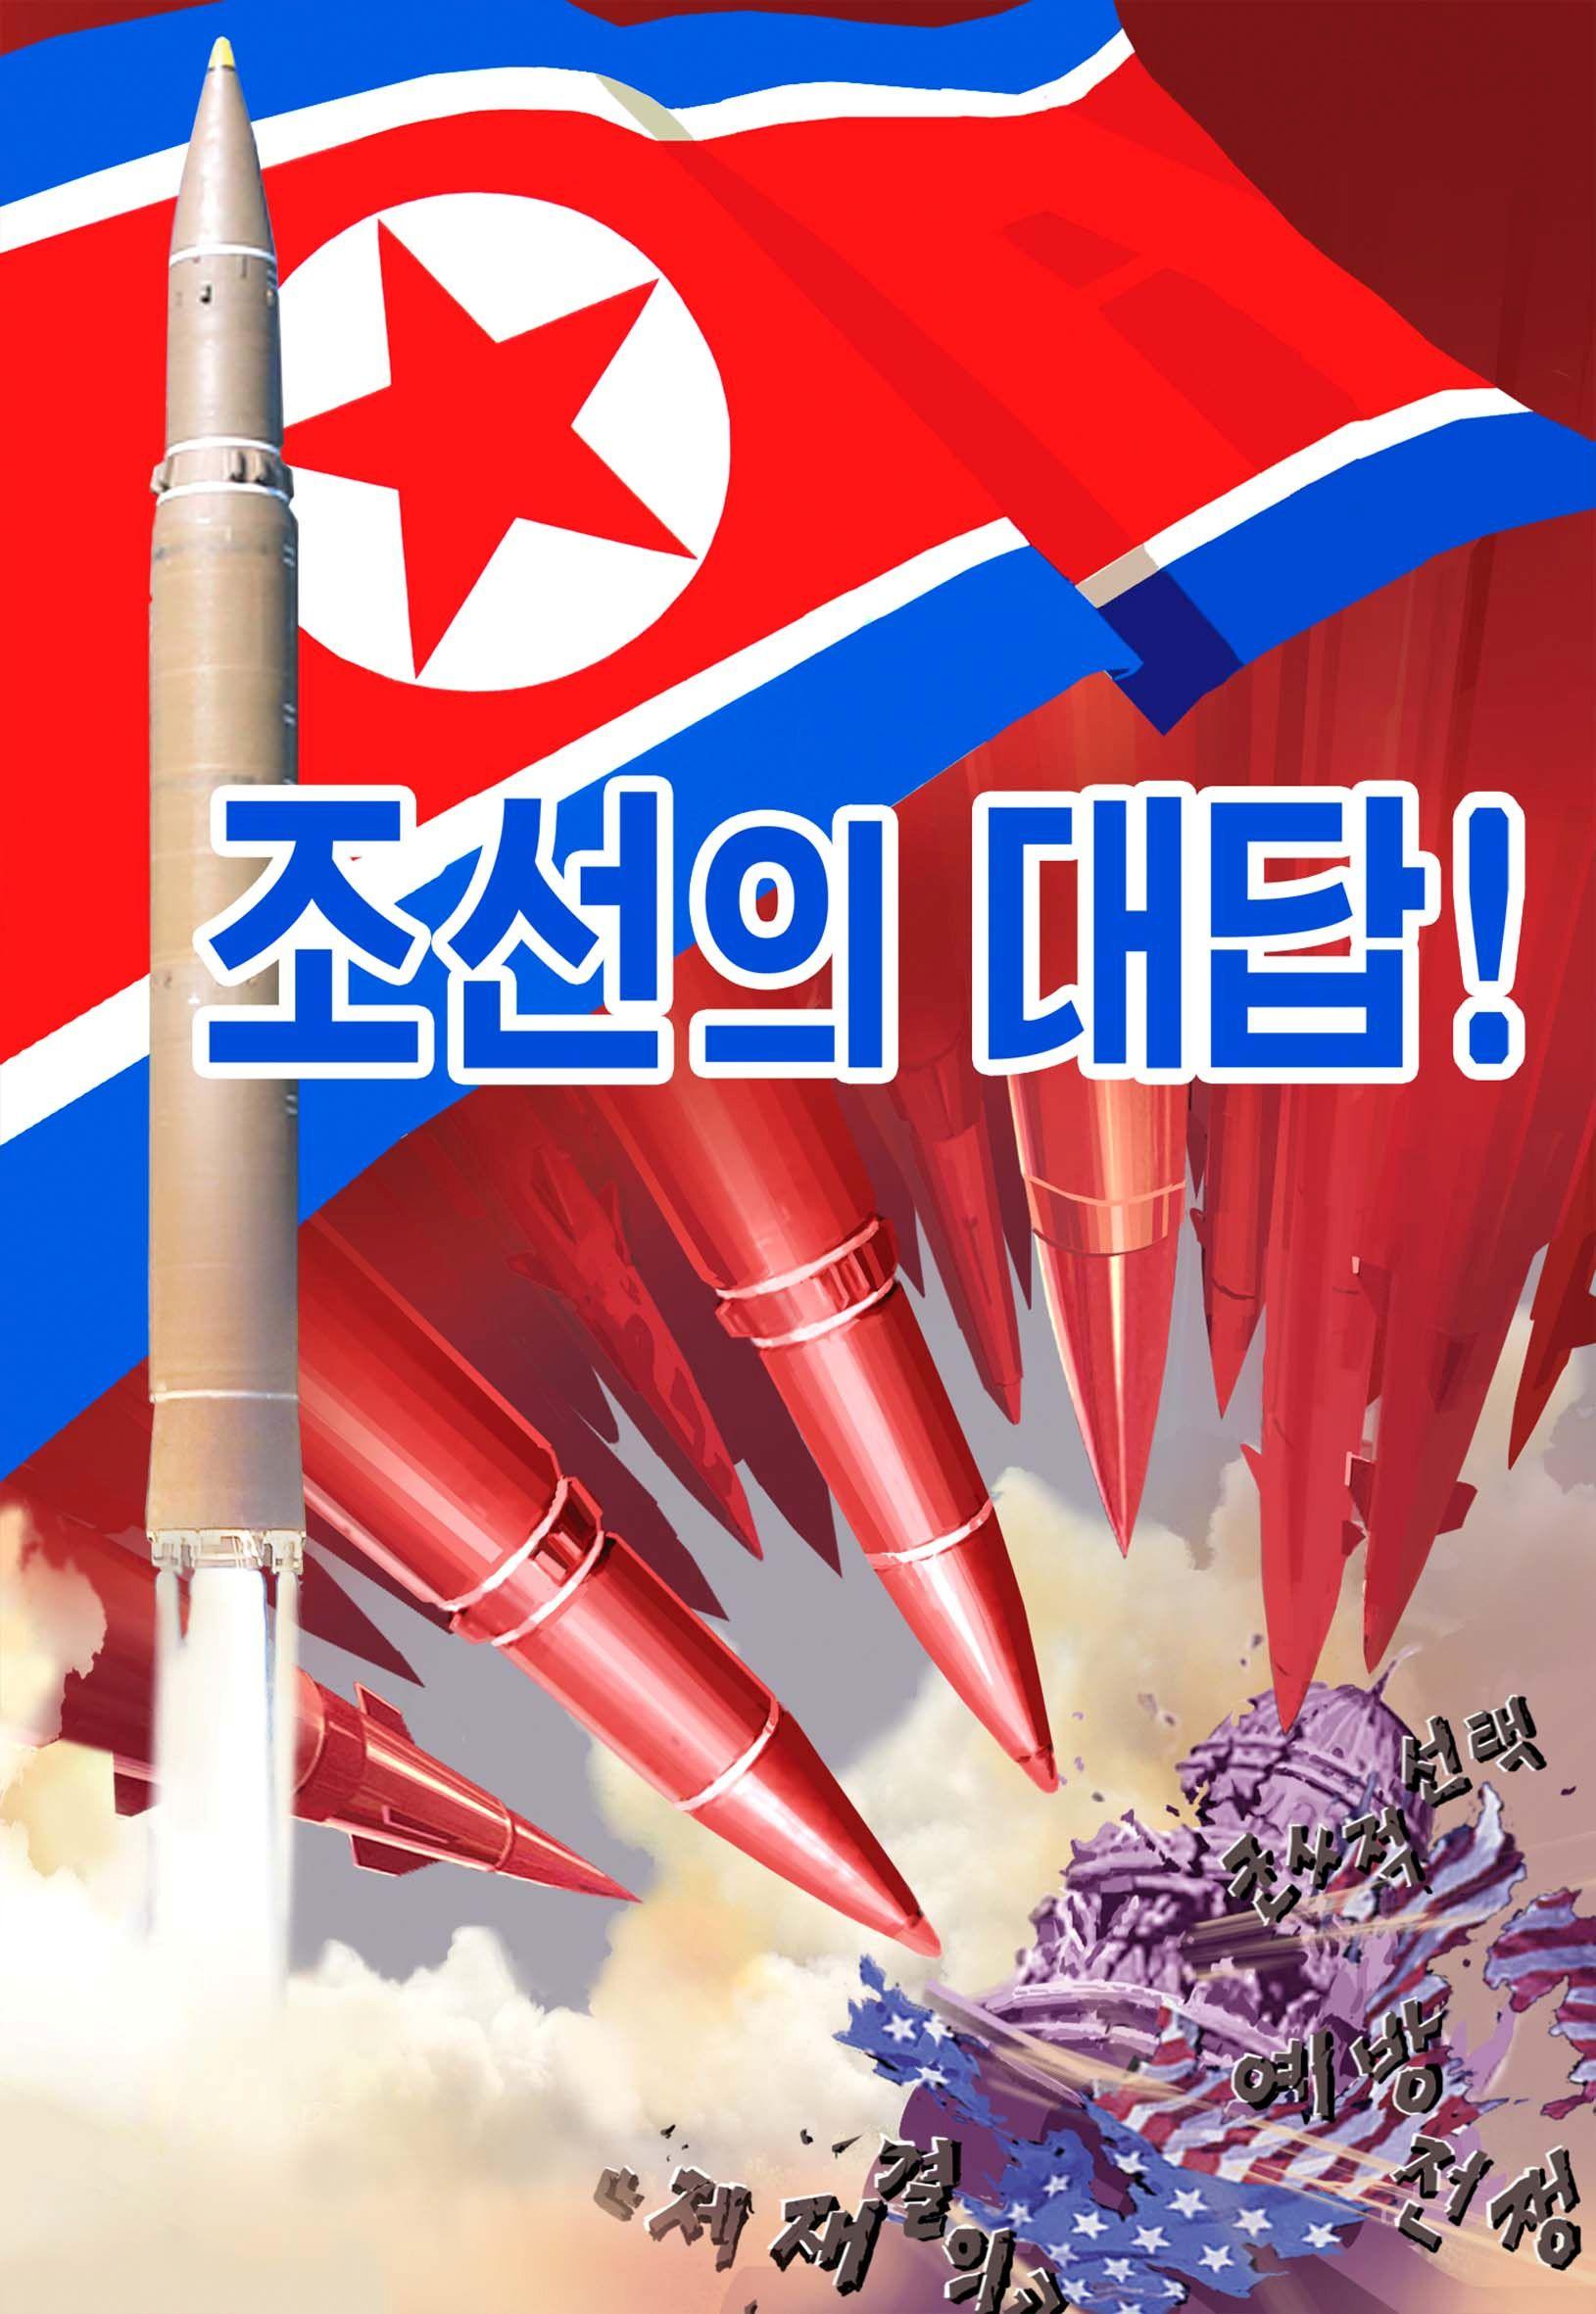 north korea targets u s capitol in latest propaganda posters to